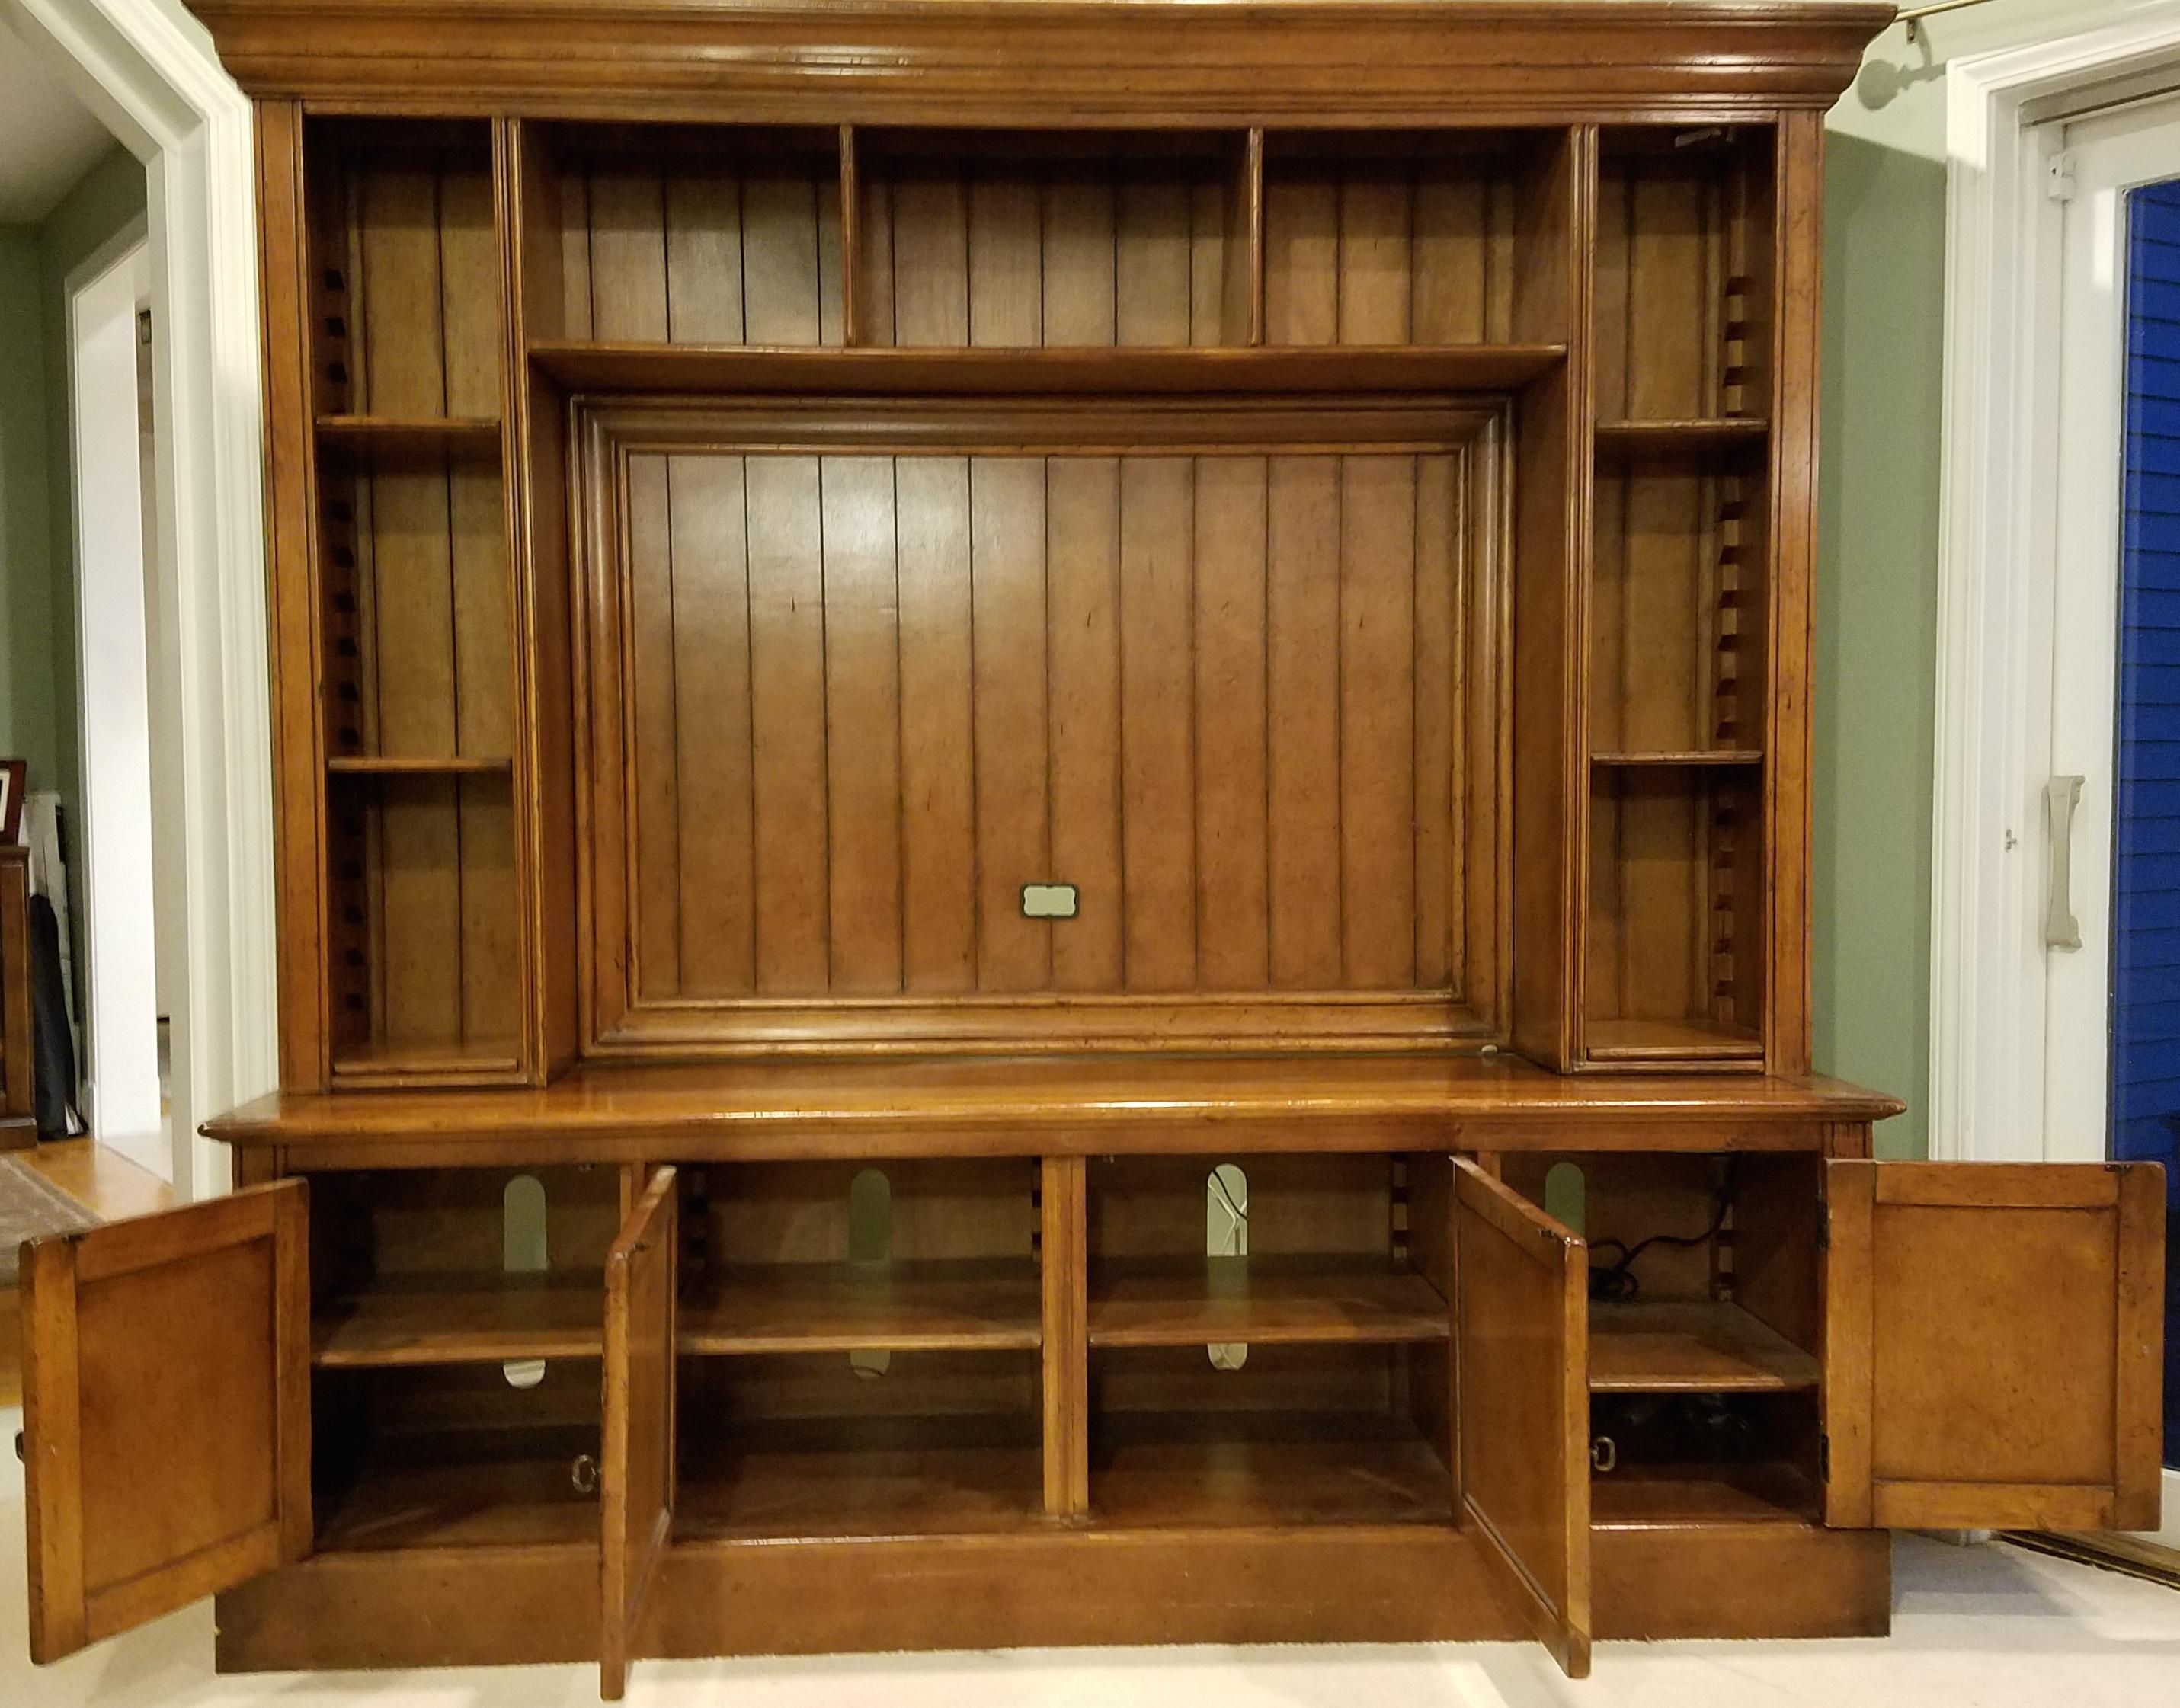 hooker furniture entertainment center. Stickley Hooker Furniture Entertainment Center / Hutch - 2 Pc. Image Of 9